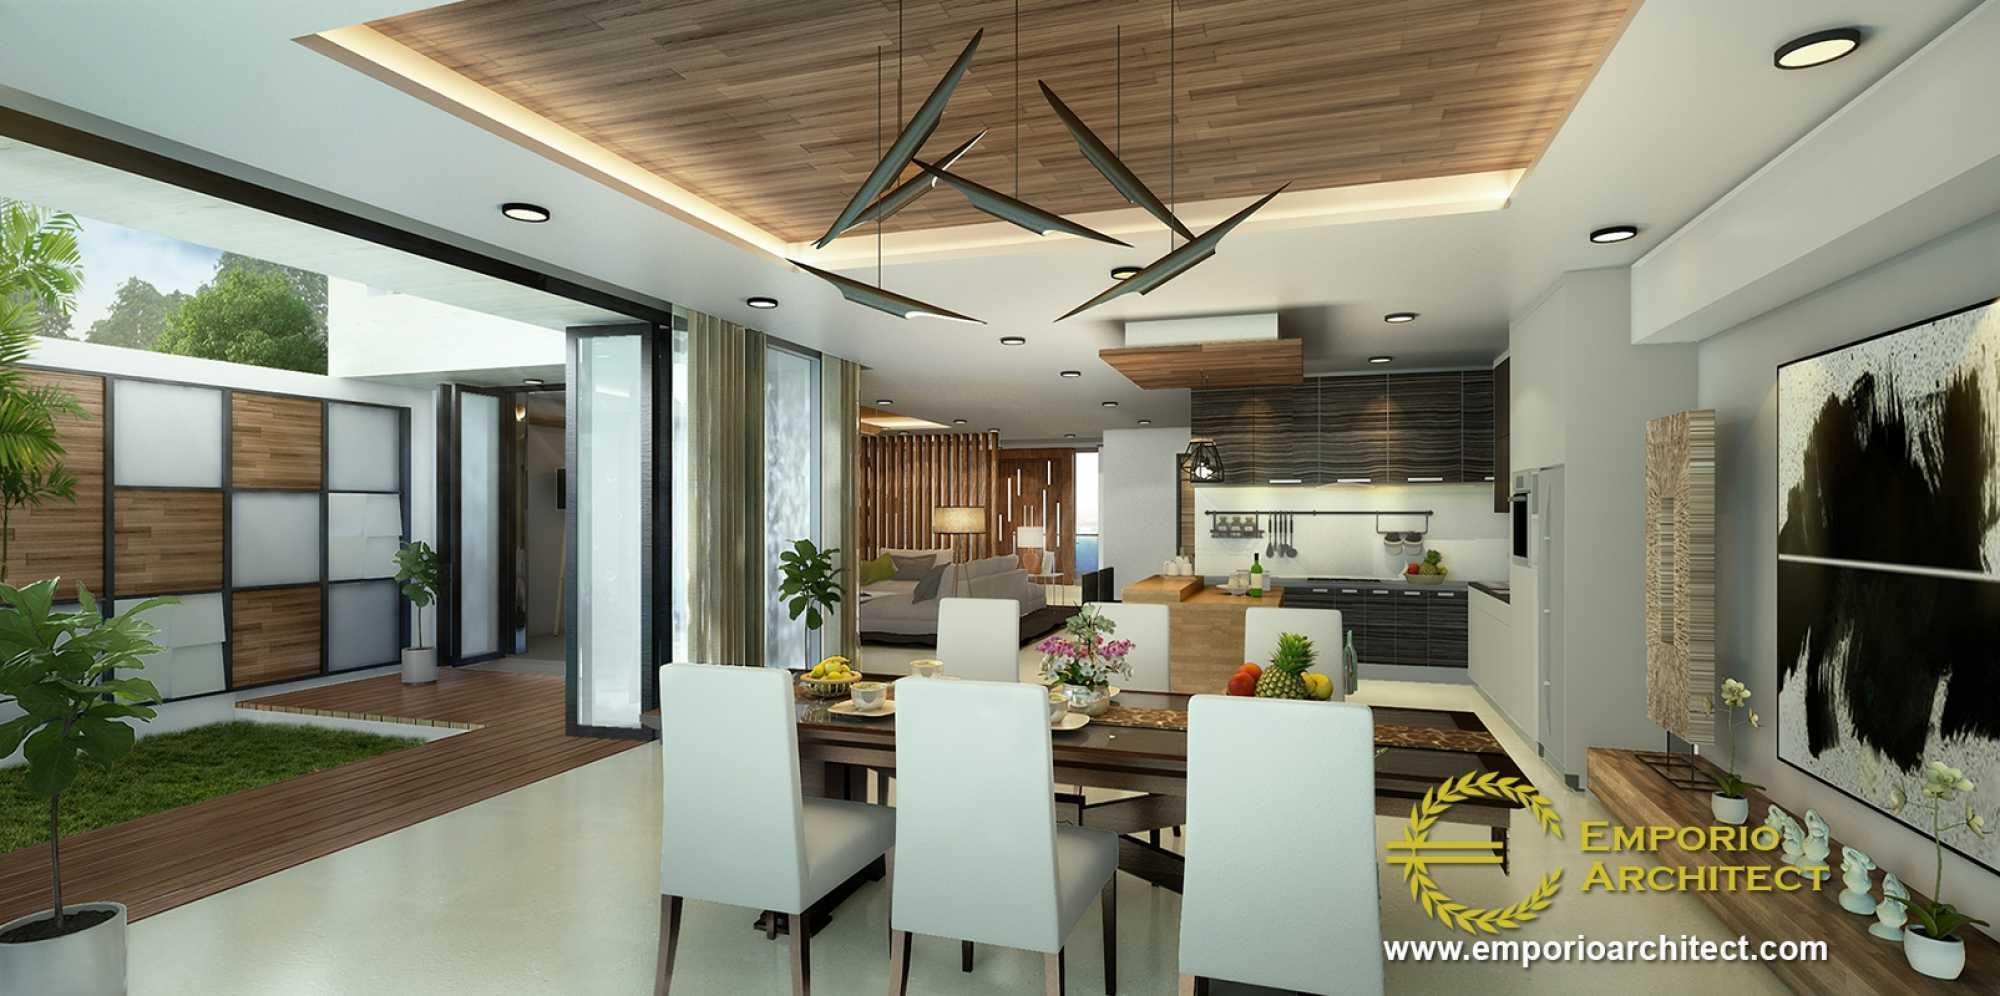 Emporio Architect Desain Rumah Modern Tropis 312 @ Bogor Bogor, Jawa Barat, Indonesia Bogor, Jawa Barat, Indonesia Emporio-Architect-Desain-Rumah-Modern-Tropis-312-Bogor  73104